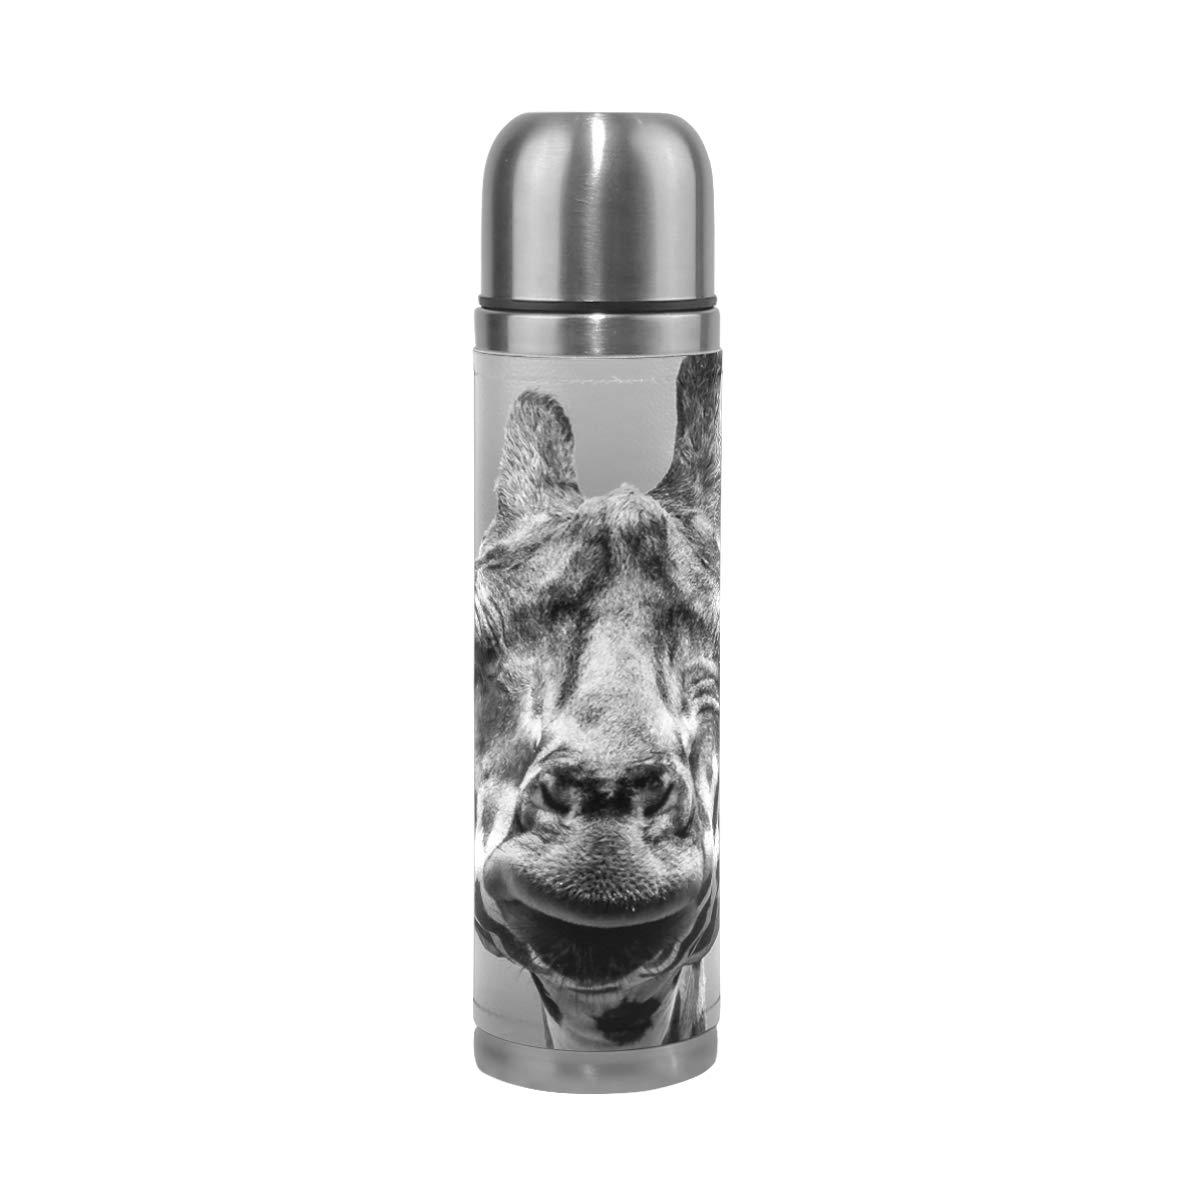 EAKLLCI Water Bottle Double Wall Vacuum Cup Insulated Stainless Steel Animal Giraffe PU Leather Travel Mug Christmas Birthday Gifts